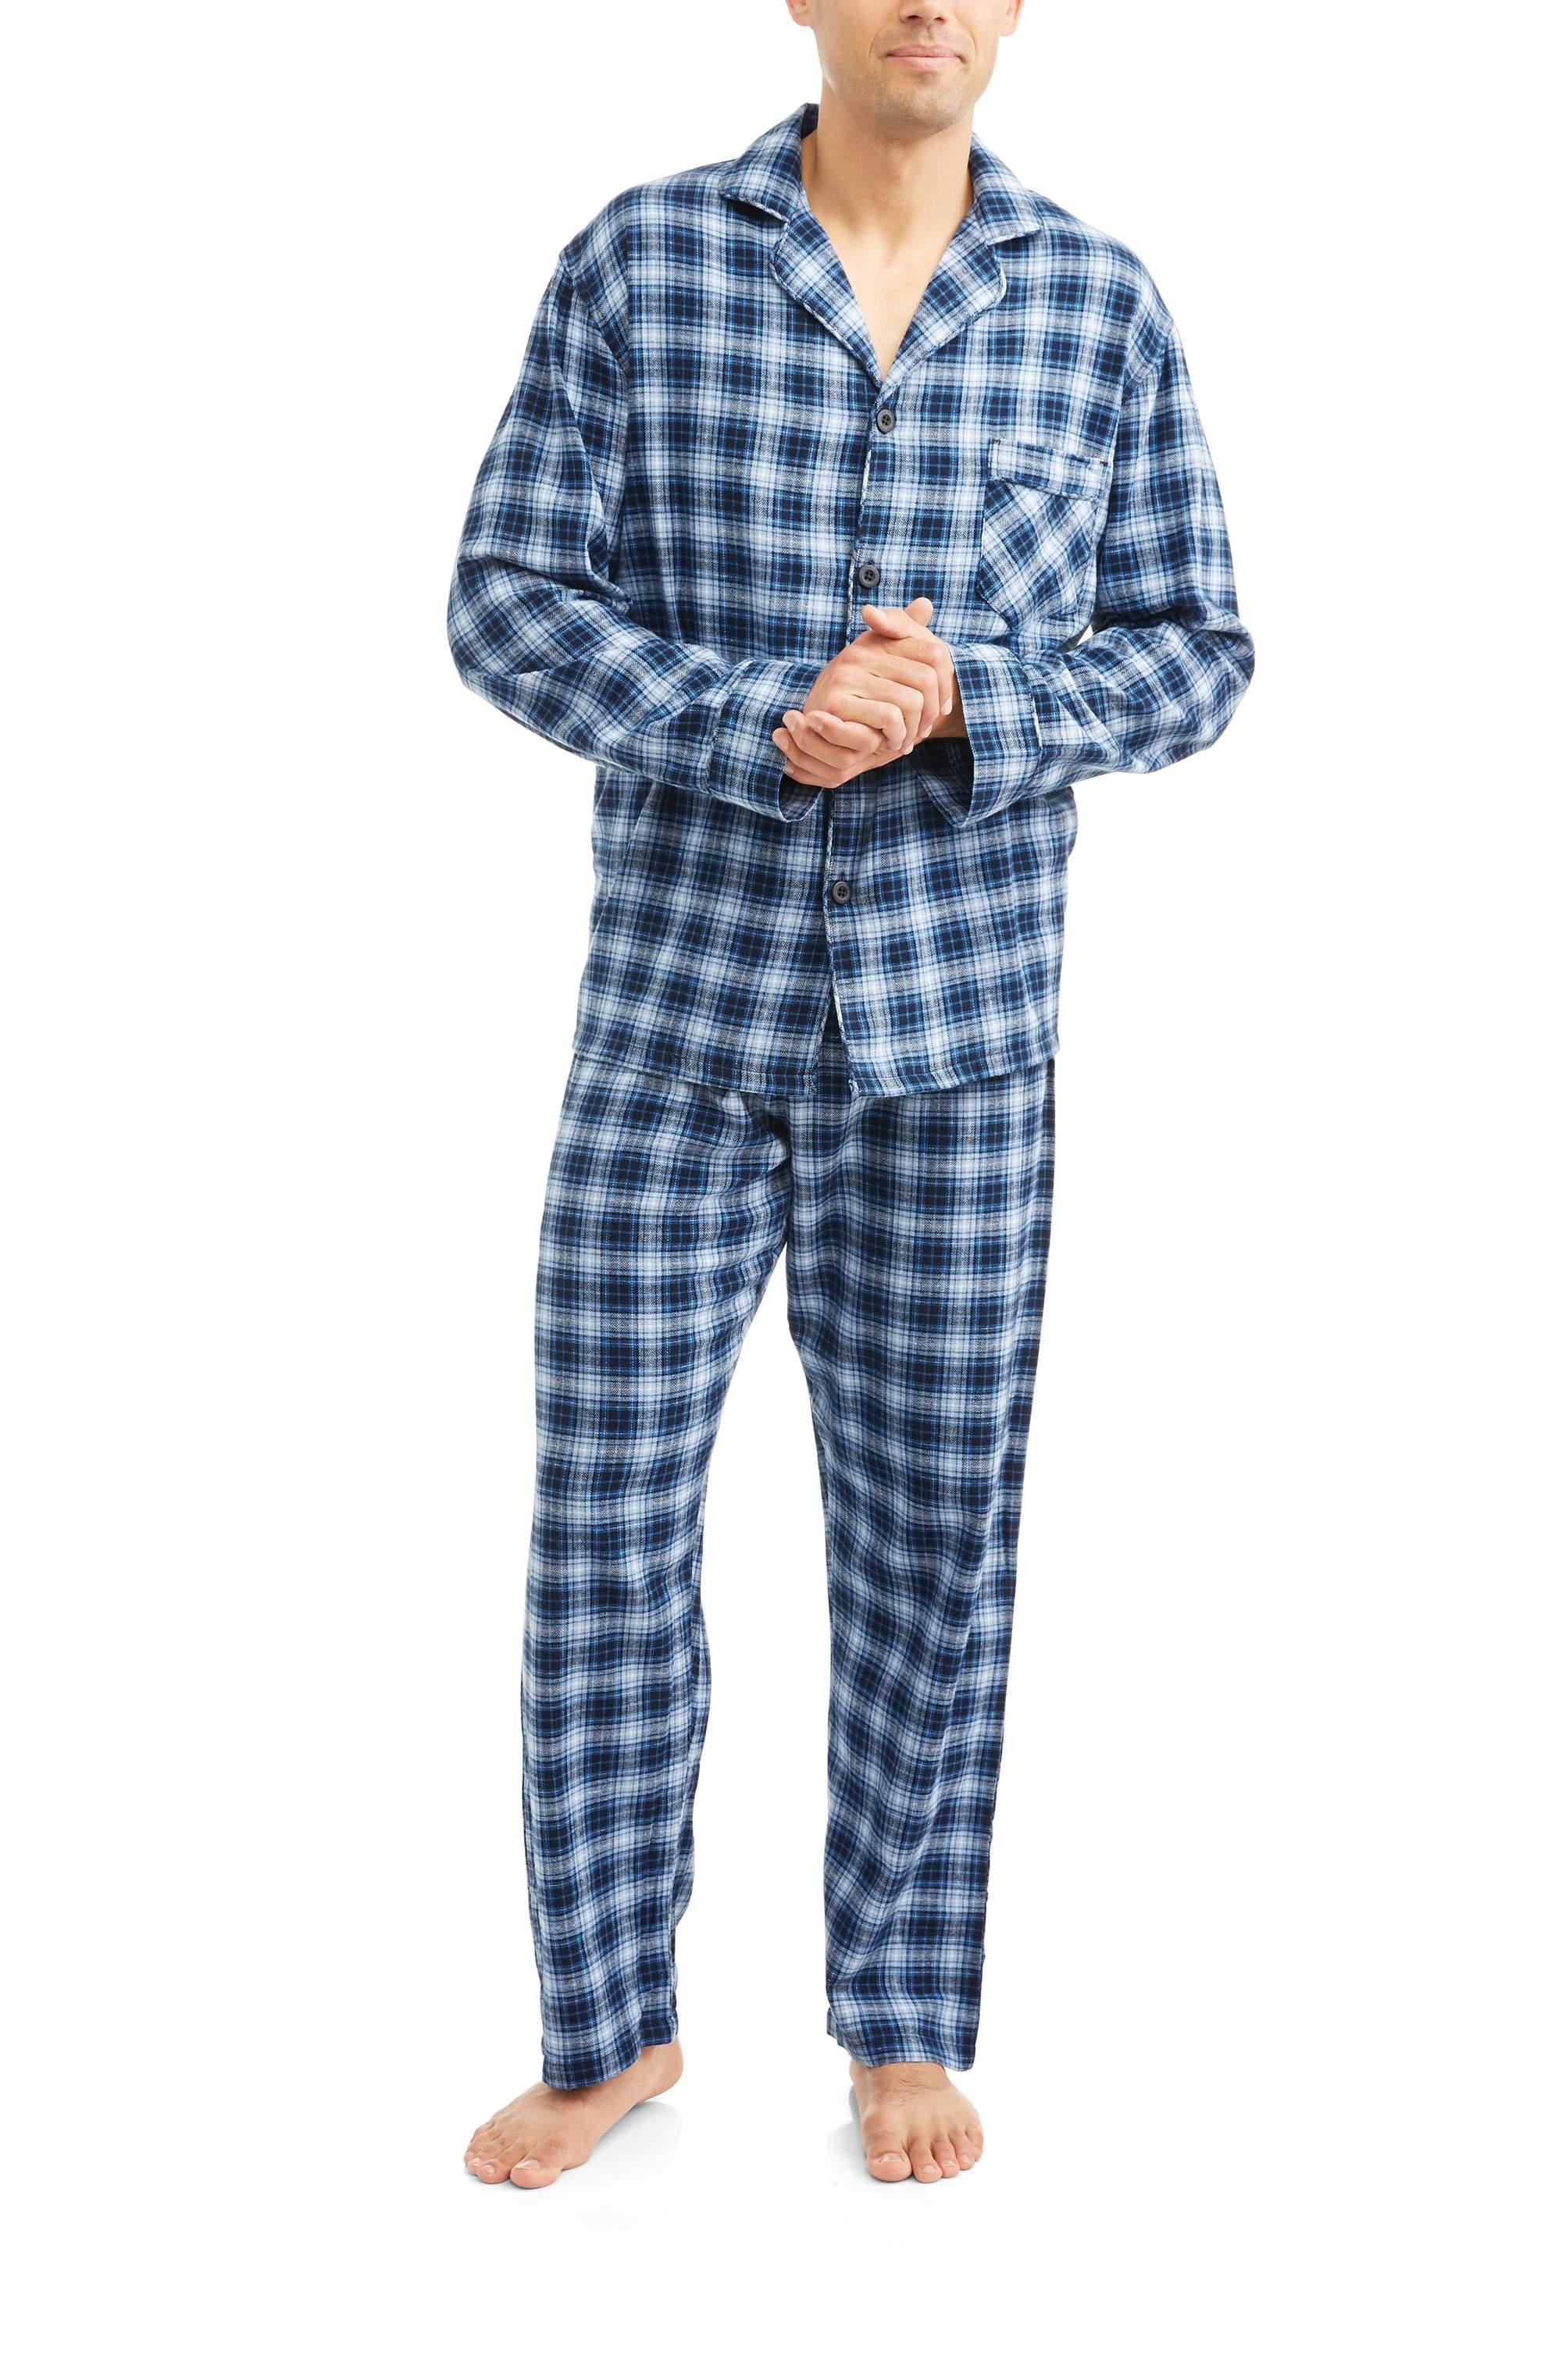 men flannel nightwear pajama set for wintercollection 2019 new